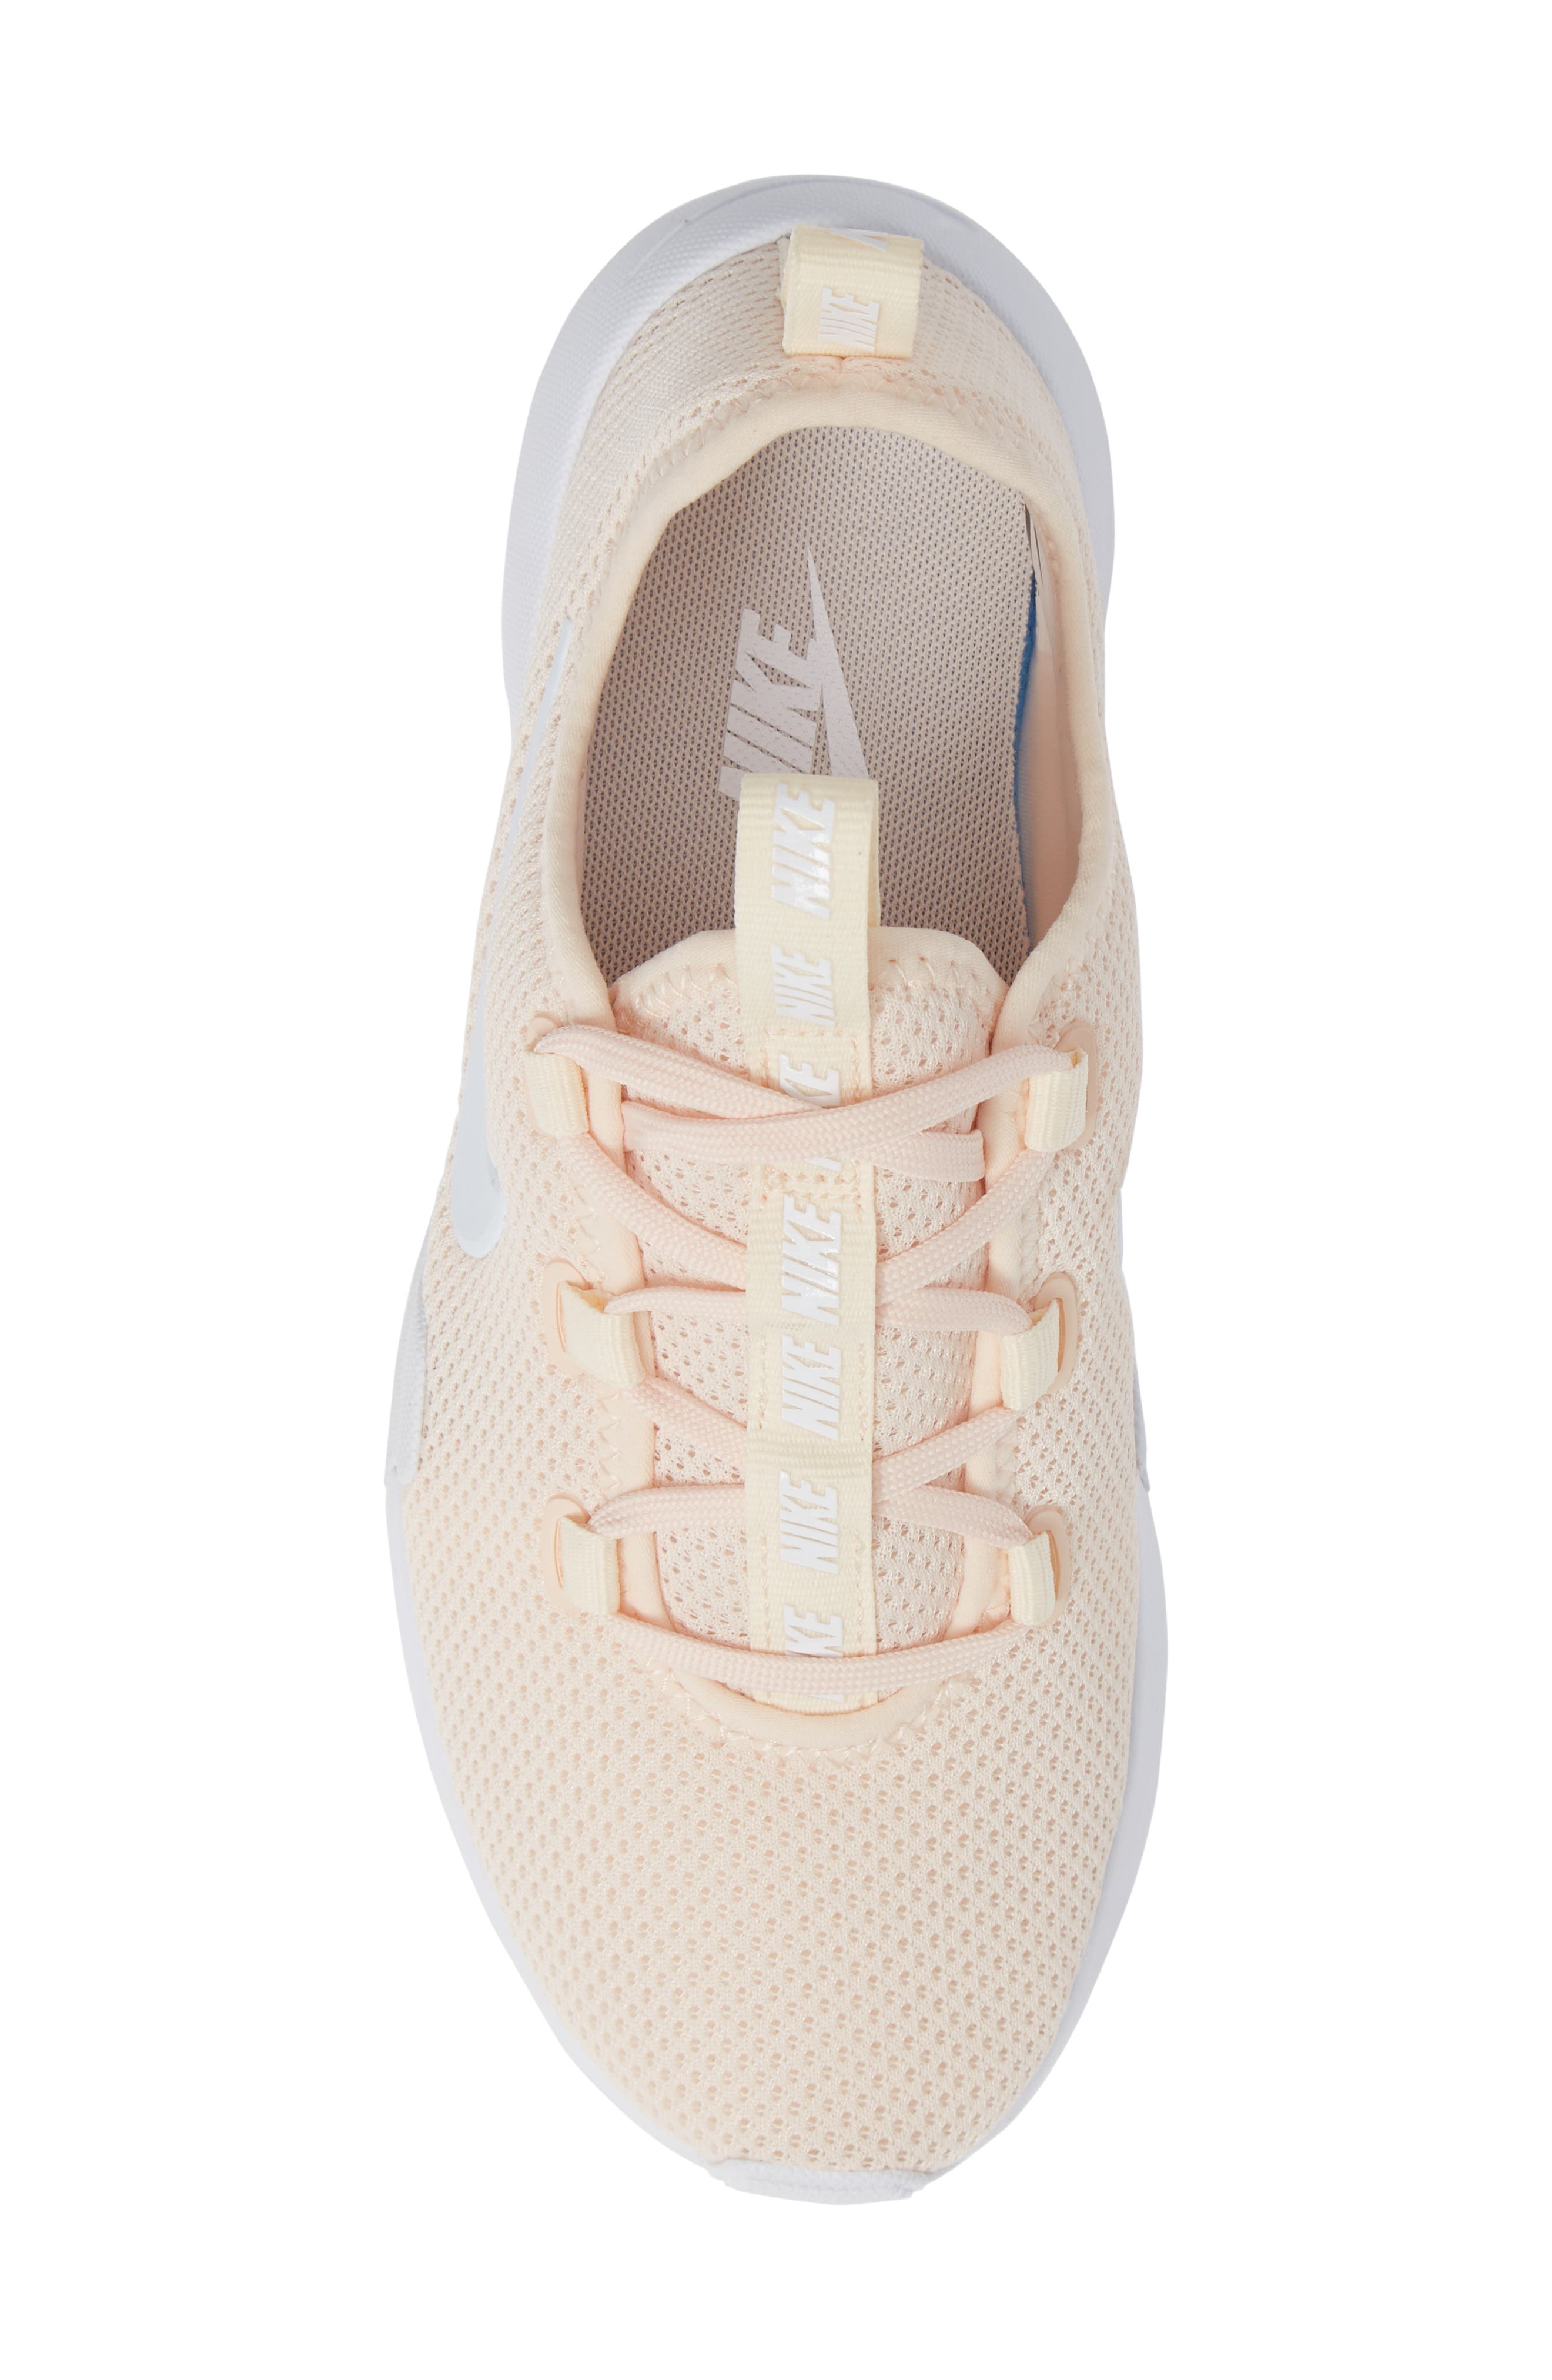 Ashin Modern Shoe,                             Alternate thumbnail 3, color,                             Guava Ice/ White/ White